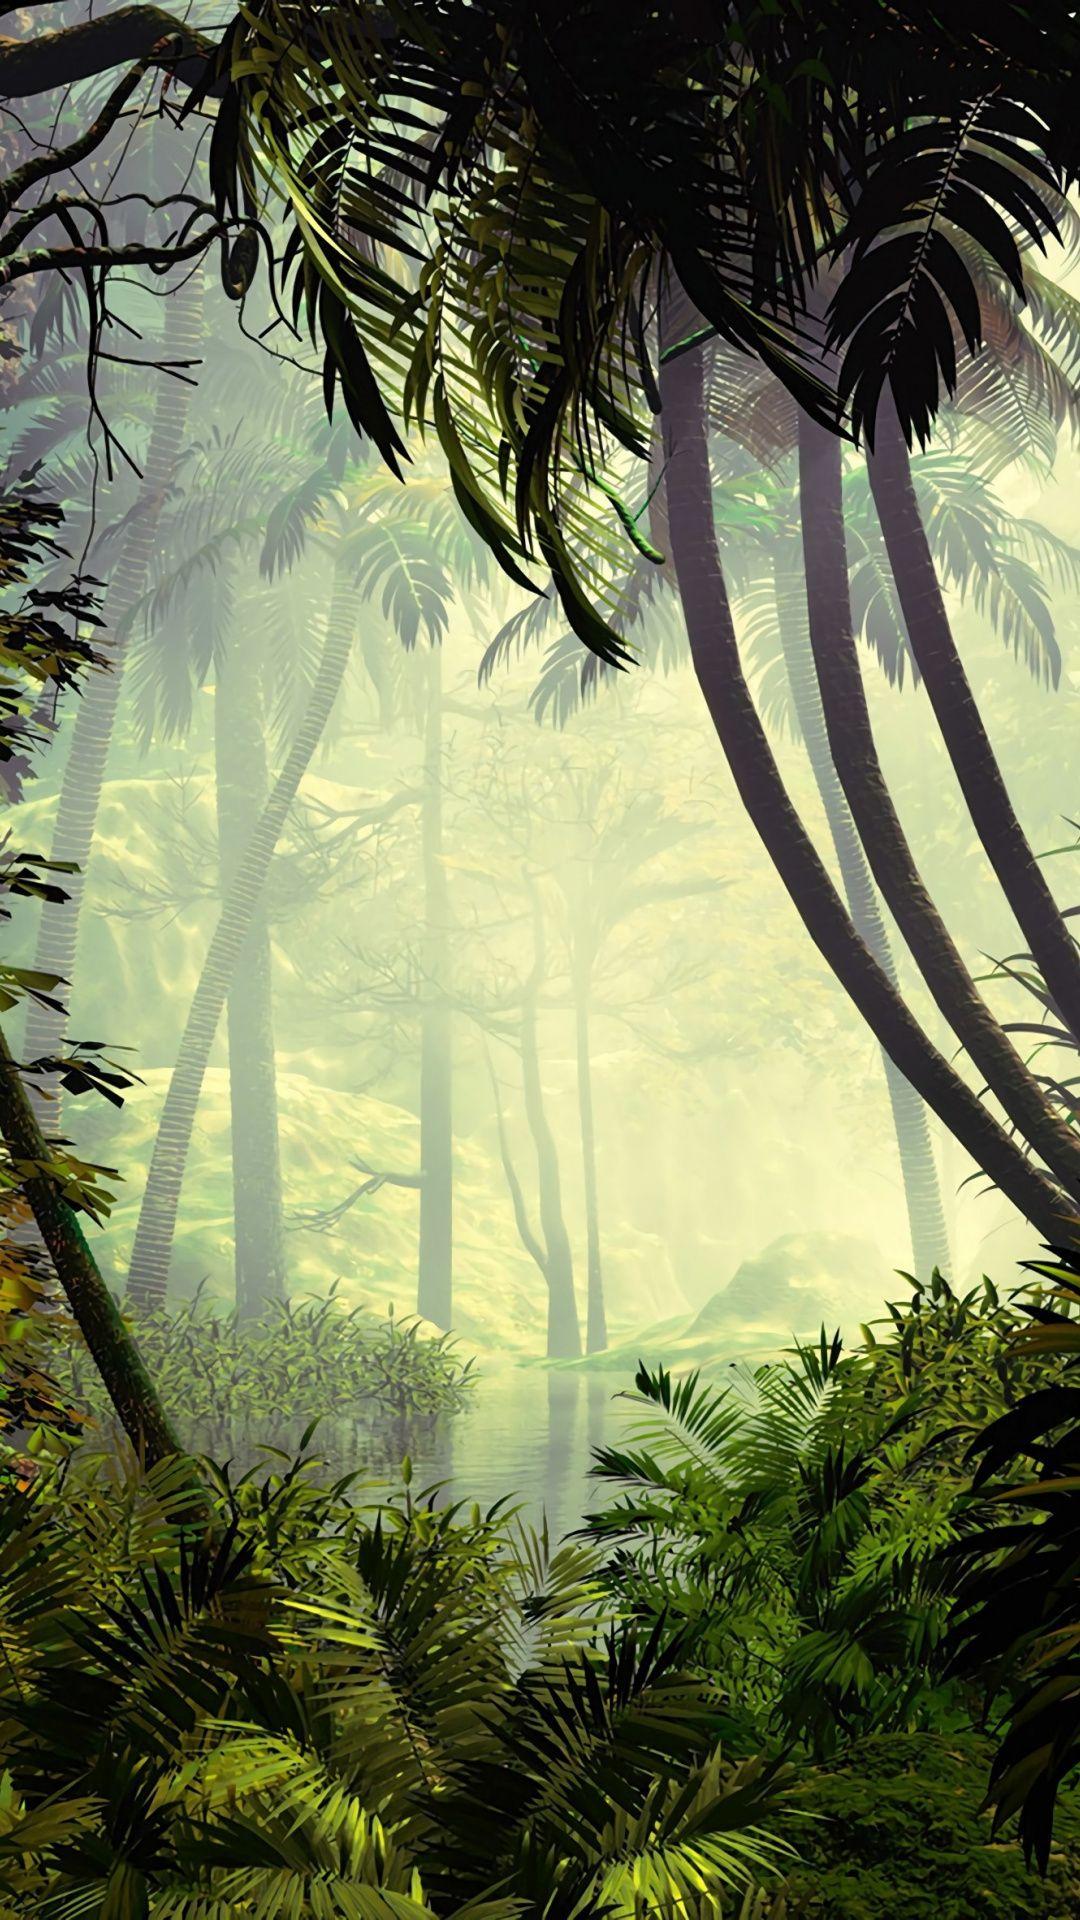 Palm Trees Jungle Dense Forest Artwork 1080x1920 Wallpaper Jungle Wallpaper Forest Wallpaper Nature Wallpaper